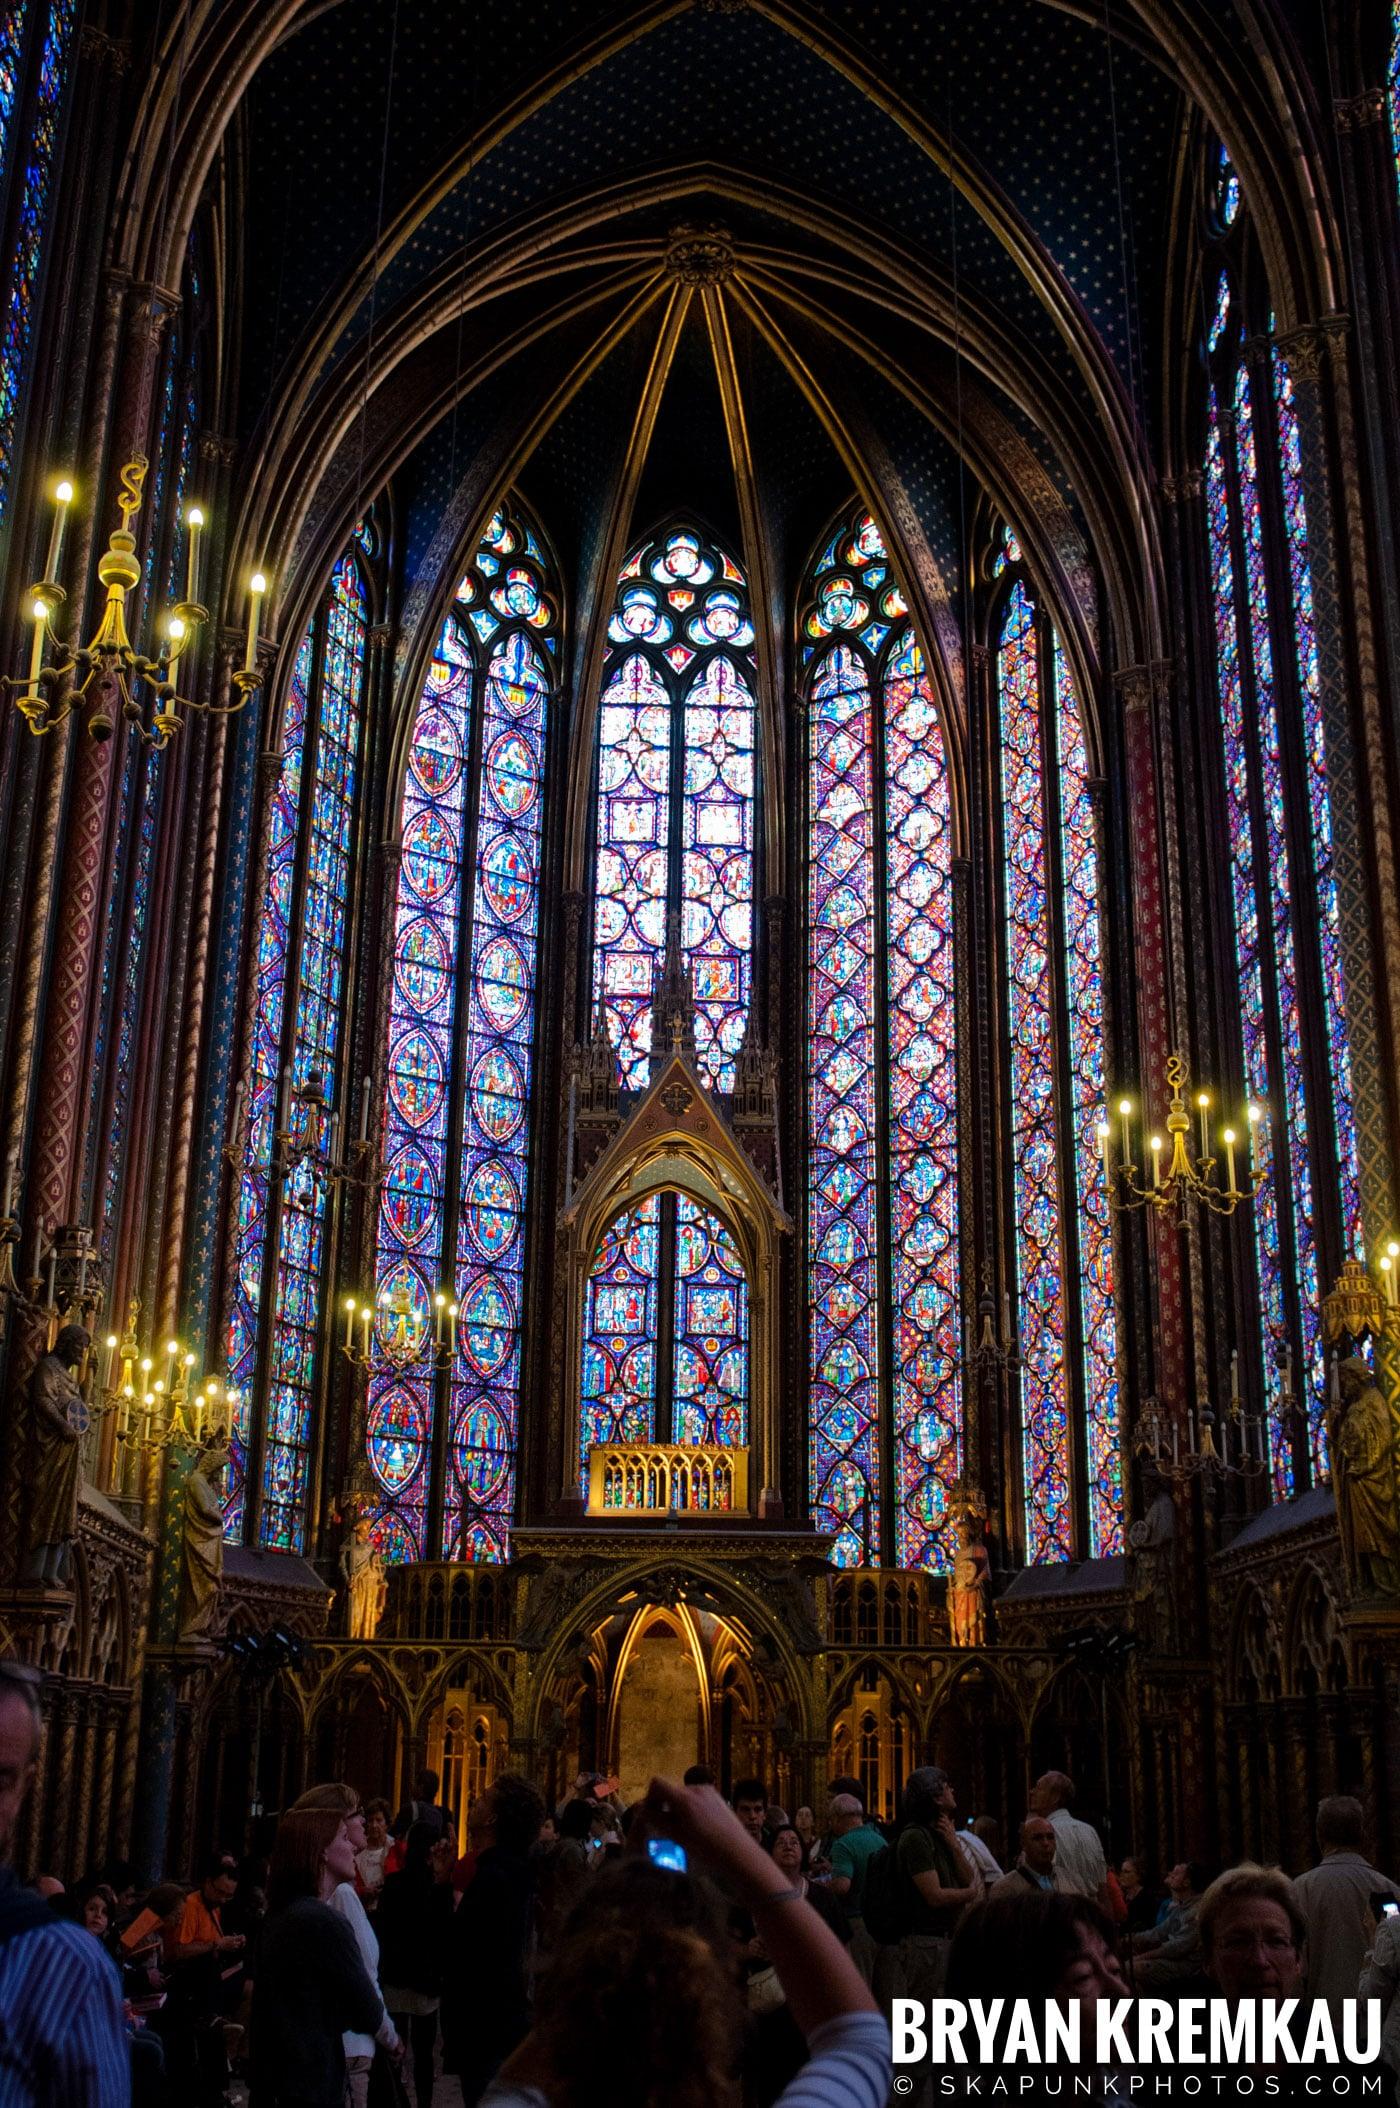 Paris, France Honeymoon - Day 5 - 7.22.11 (41)